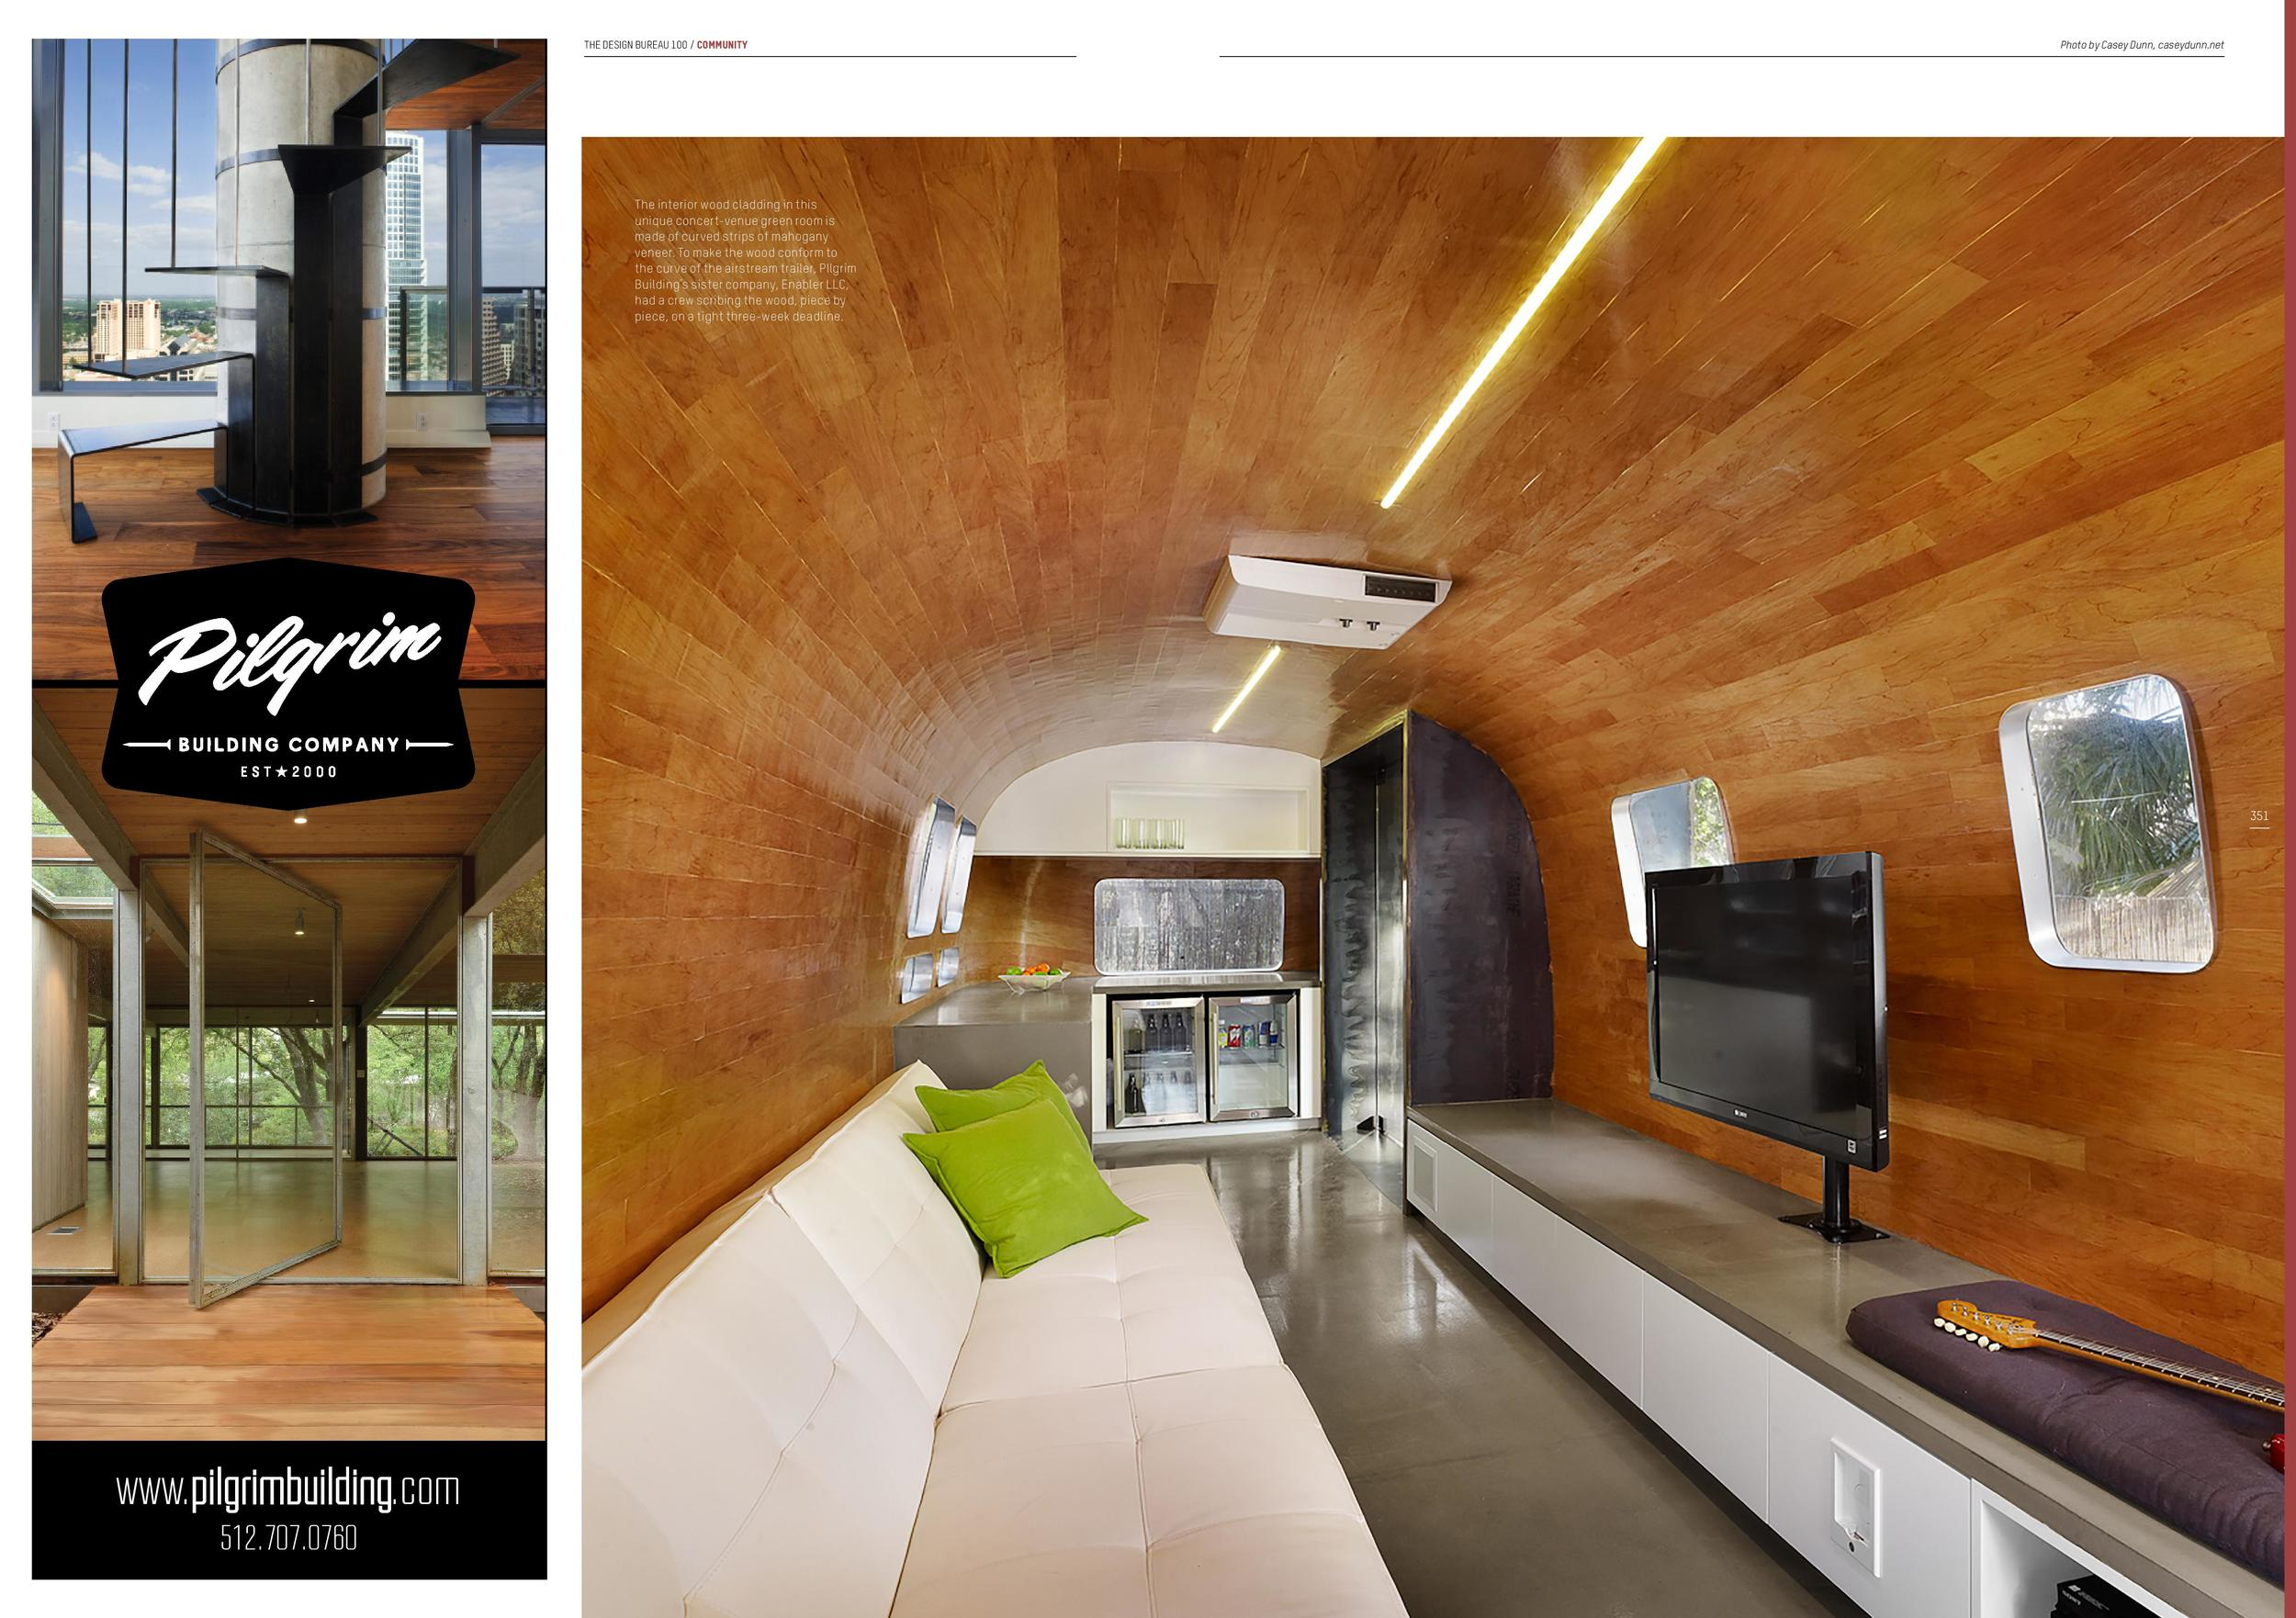 Design Bureau August 2014-page-002.jpg